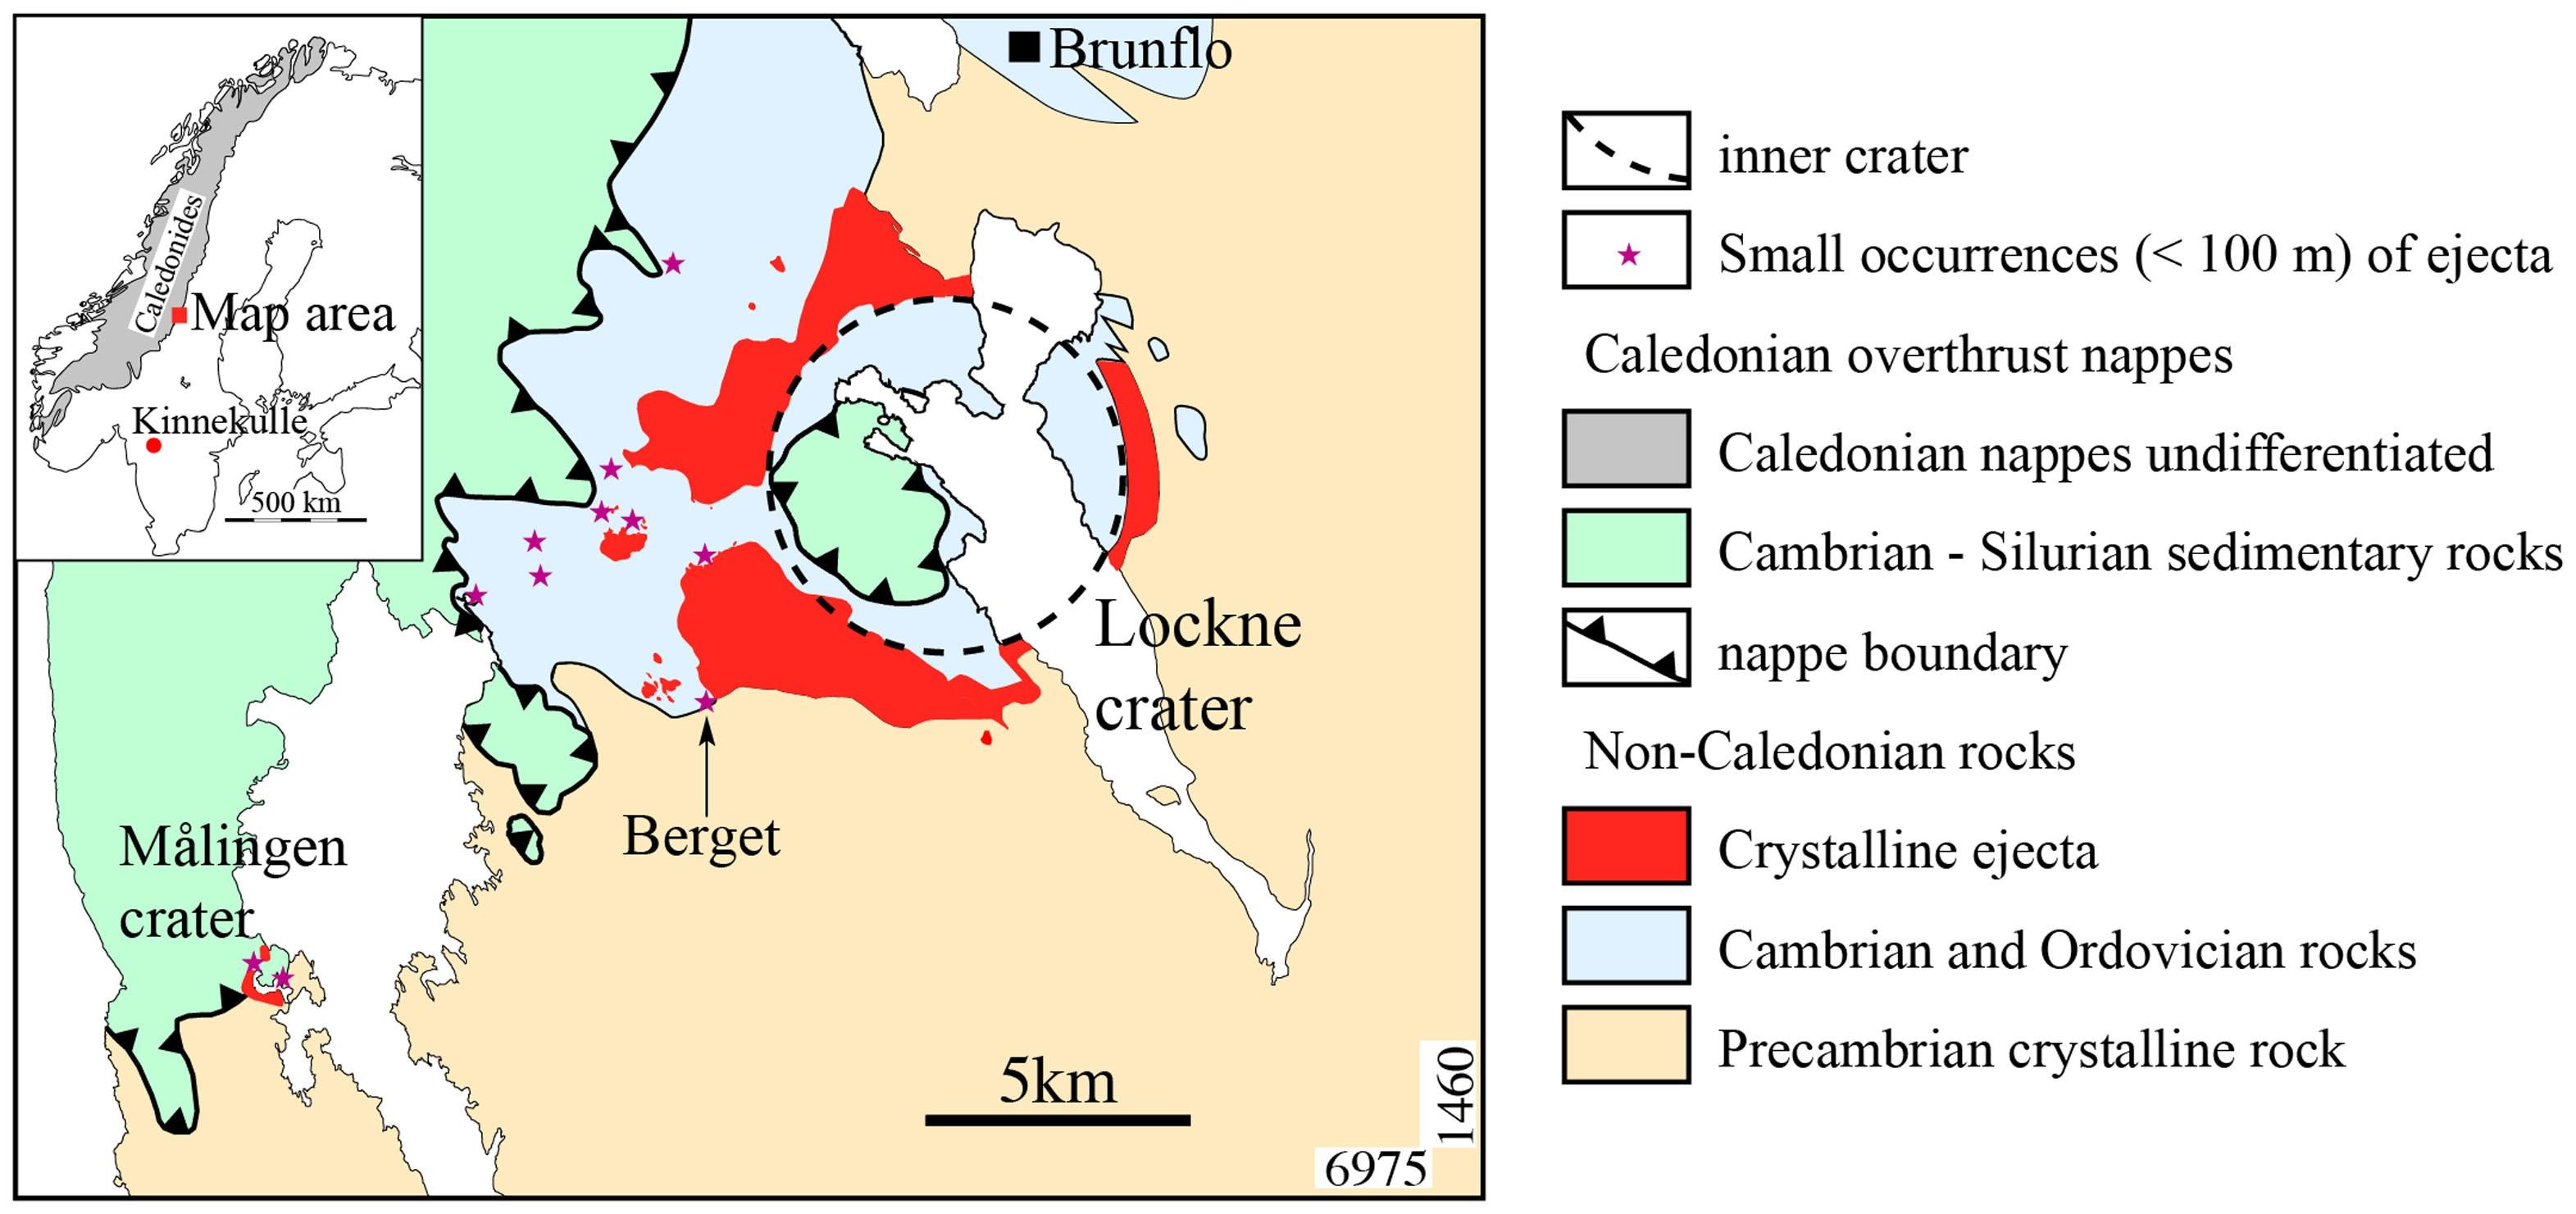 Fil:Berge - Locknesjn, Jmtland, patient-survey.net Wikipedia